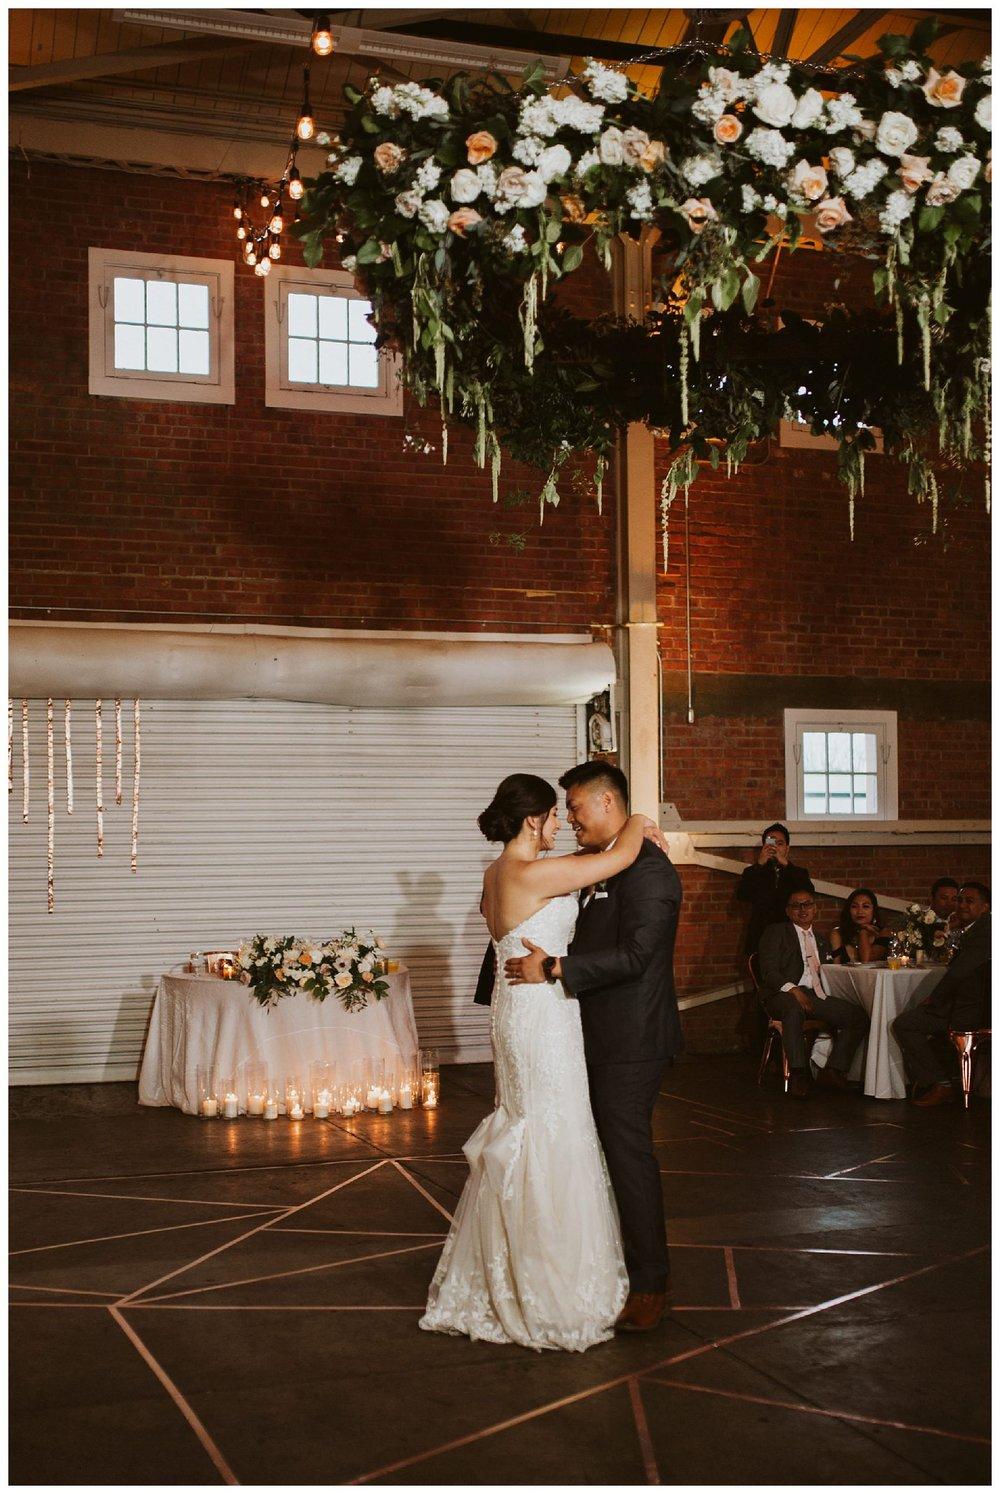 Brick_San_Diego_wedding_0053.jpg